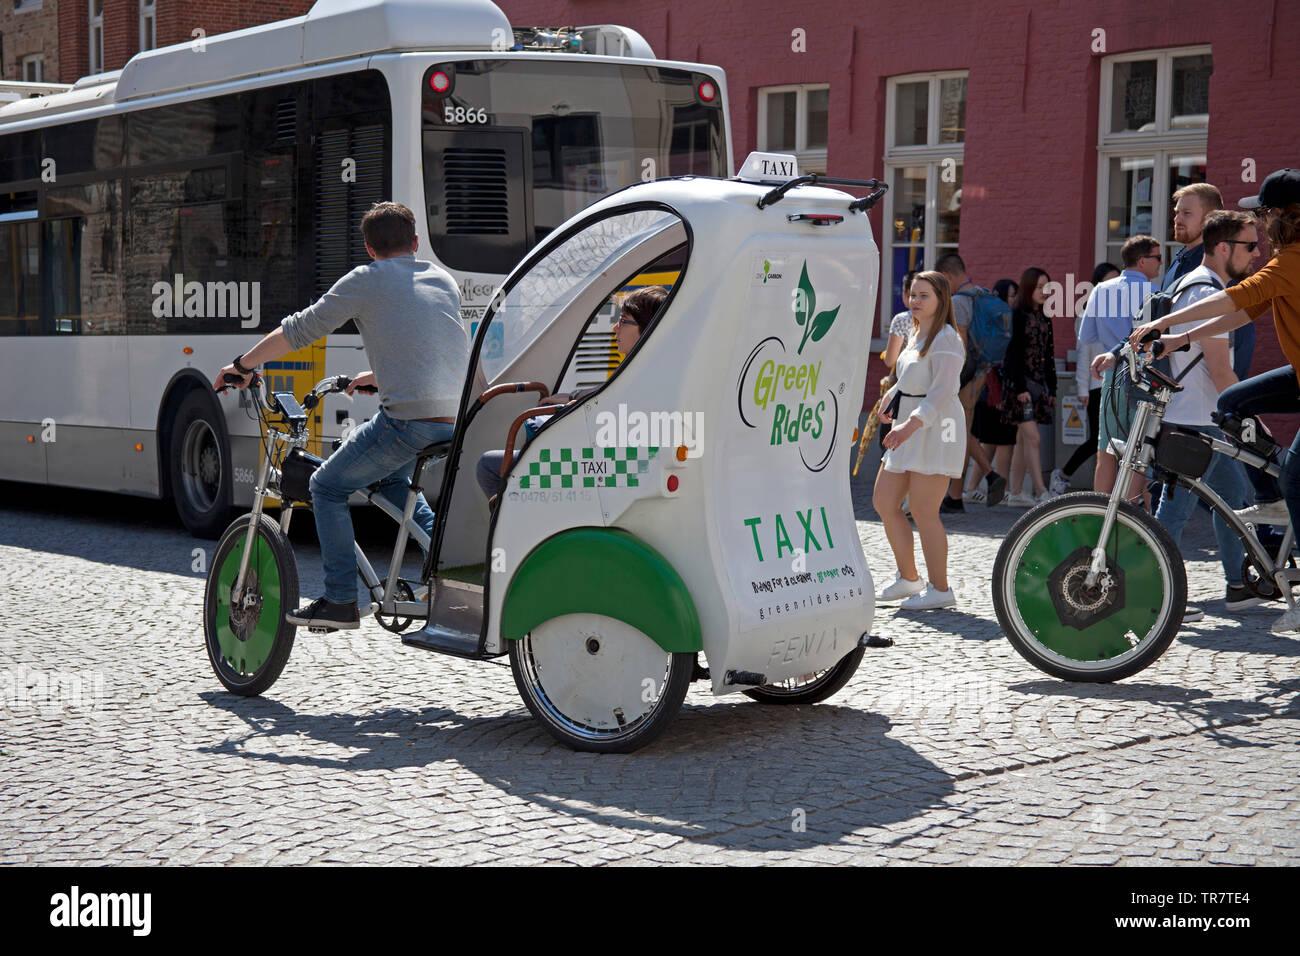 Bruges, Belgium, eco friendly, triicycle, rikshaw, taxi, vehicle, Europe Stock Photo